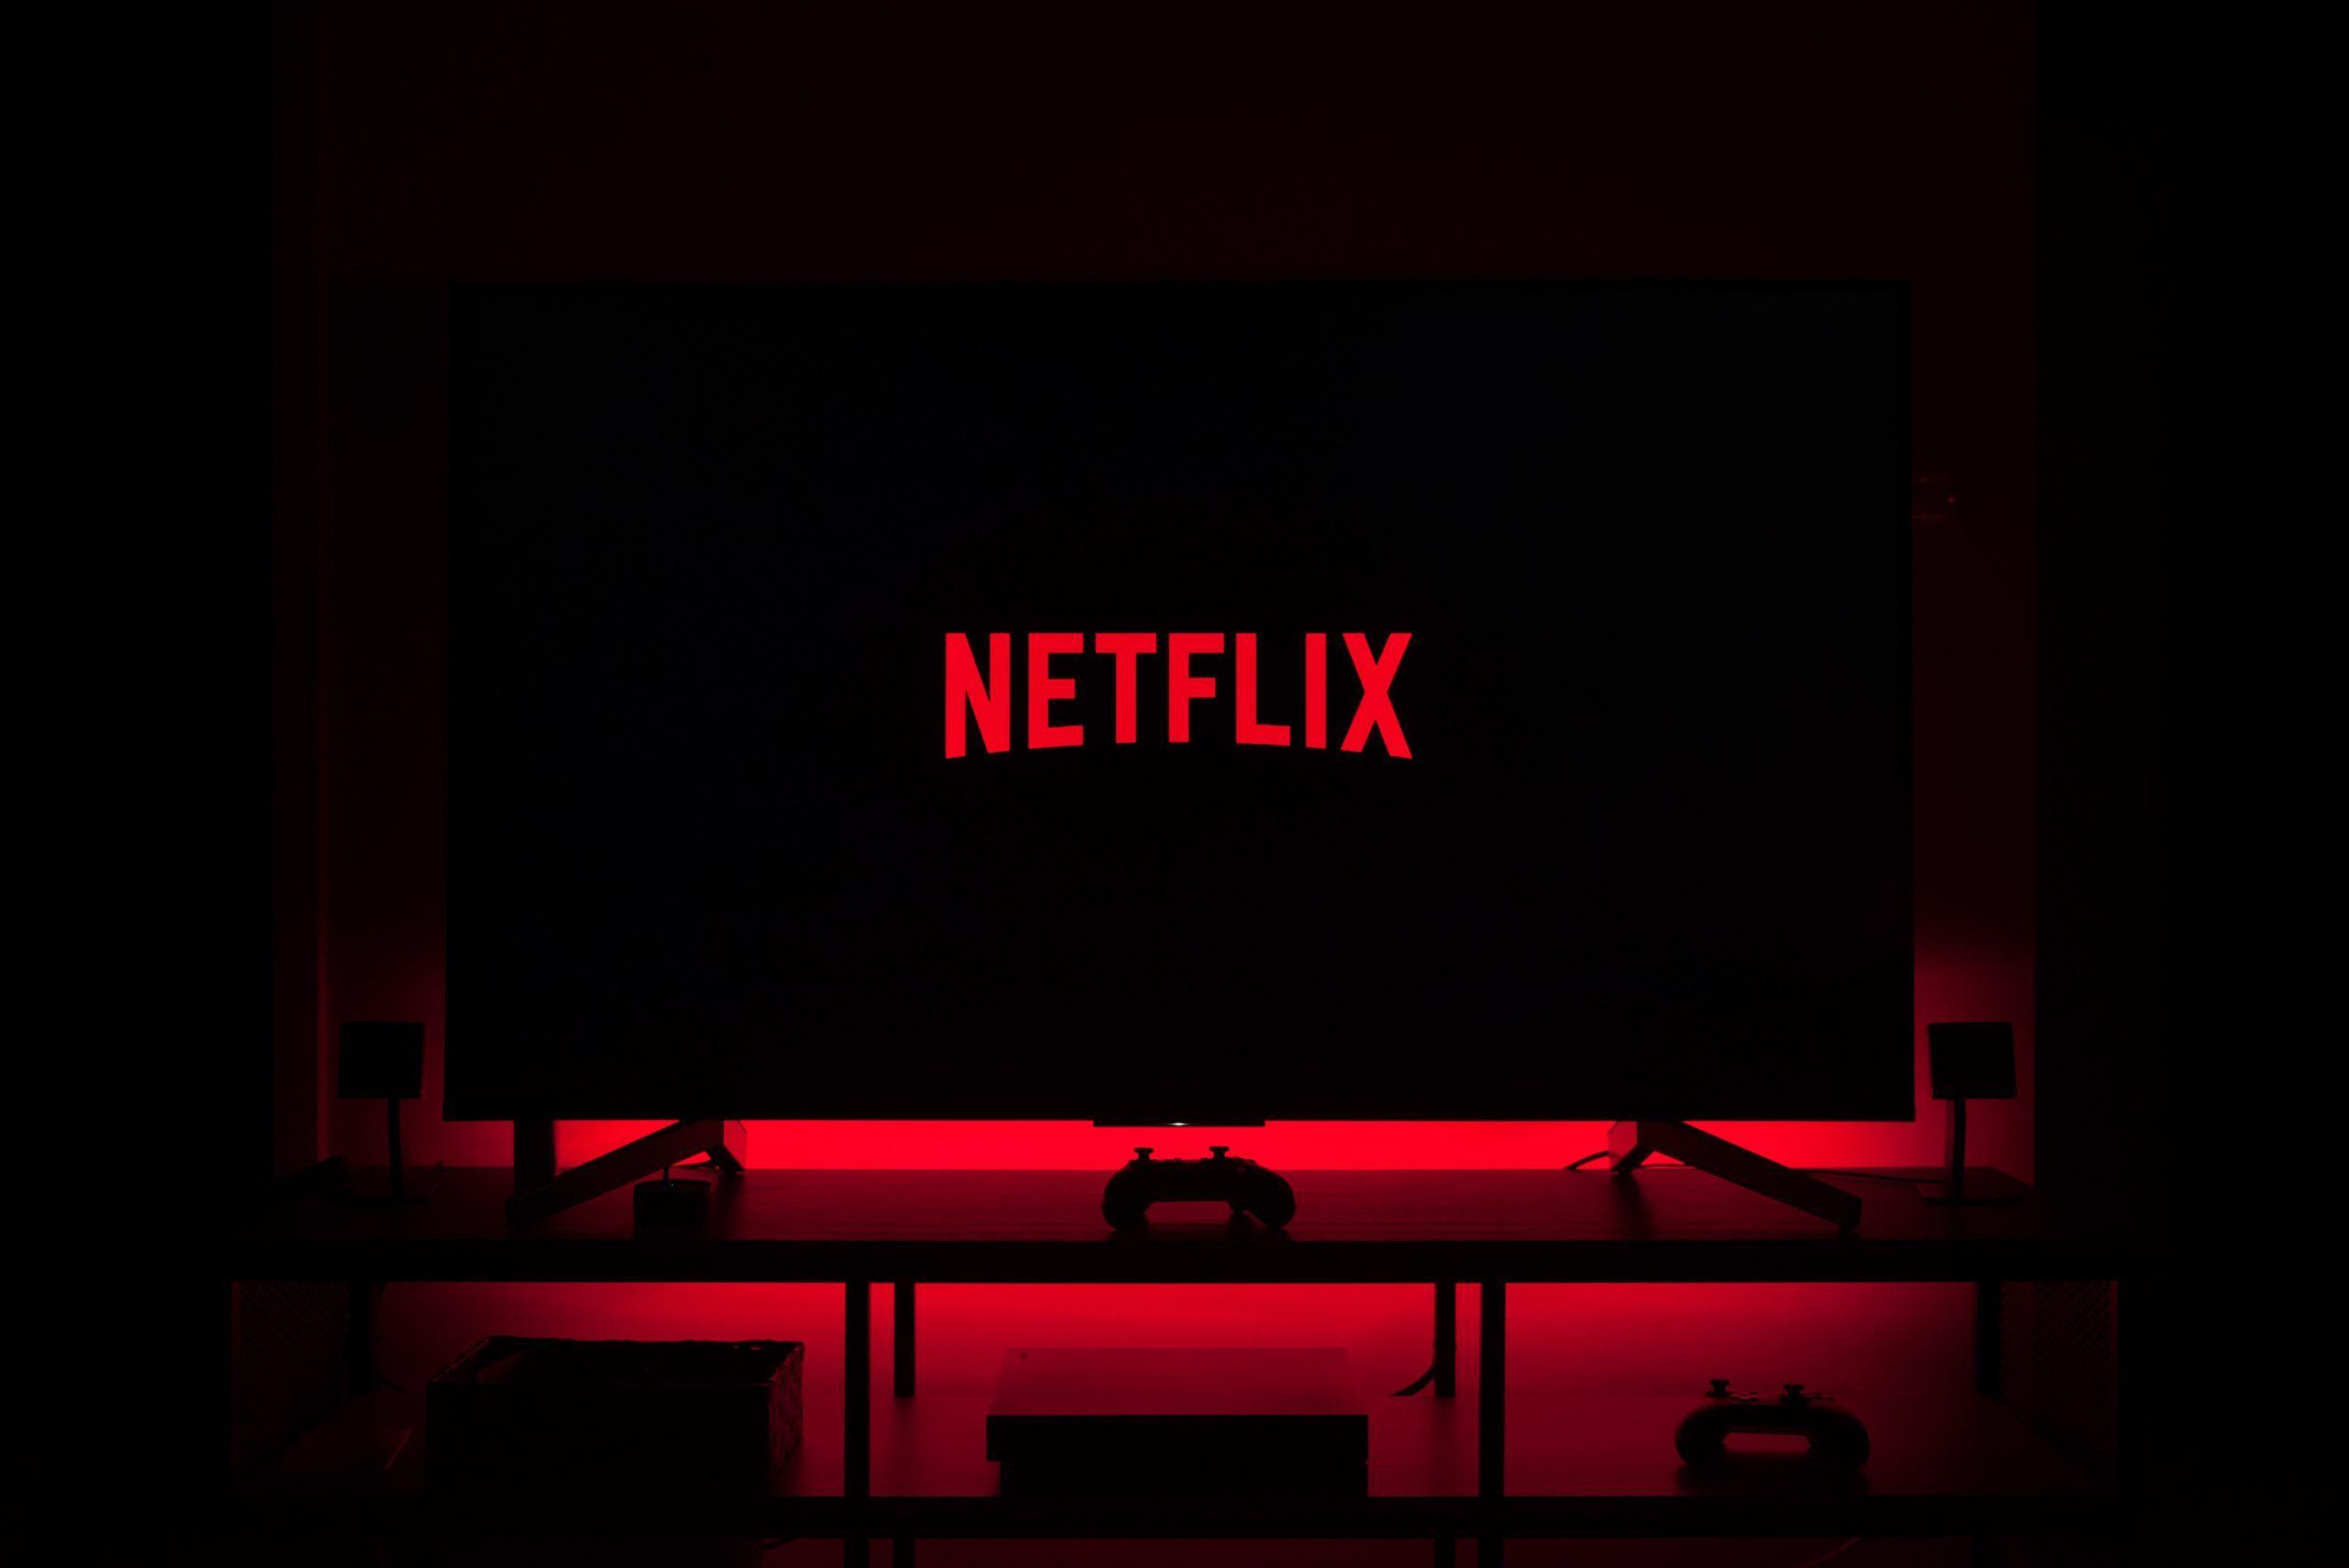 Netflix Deneme Süreci